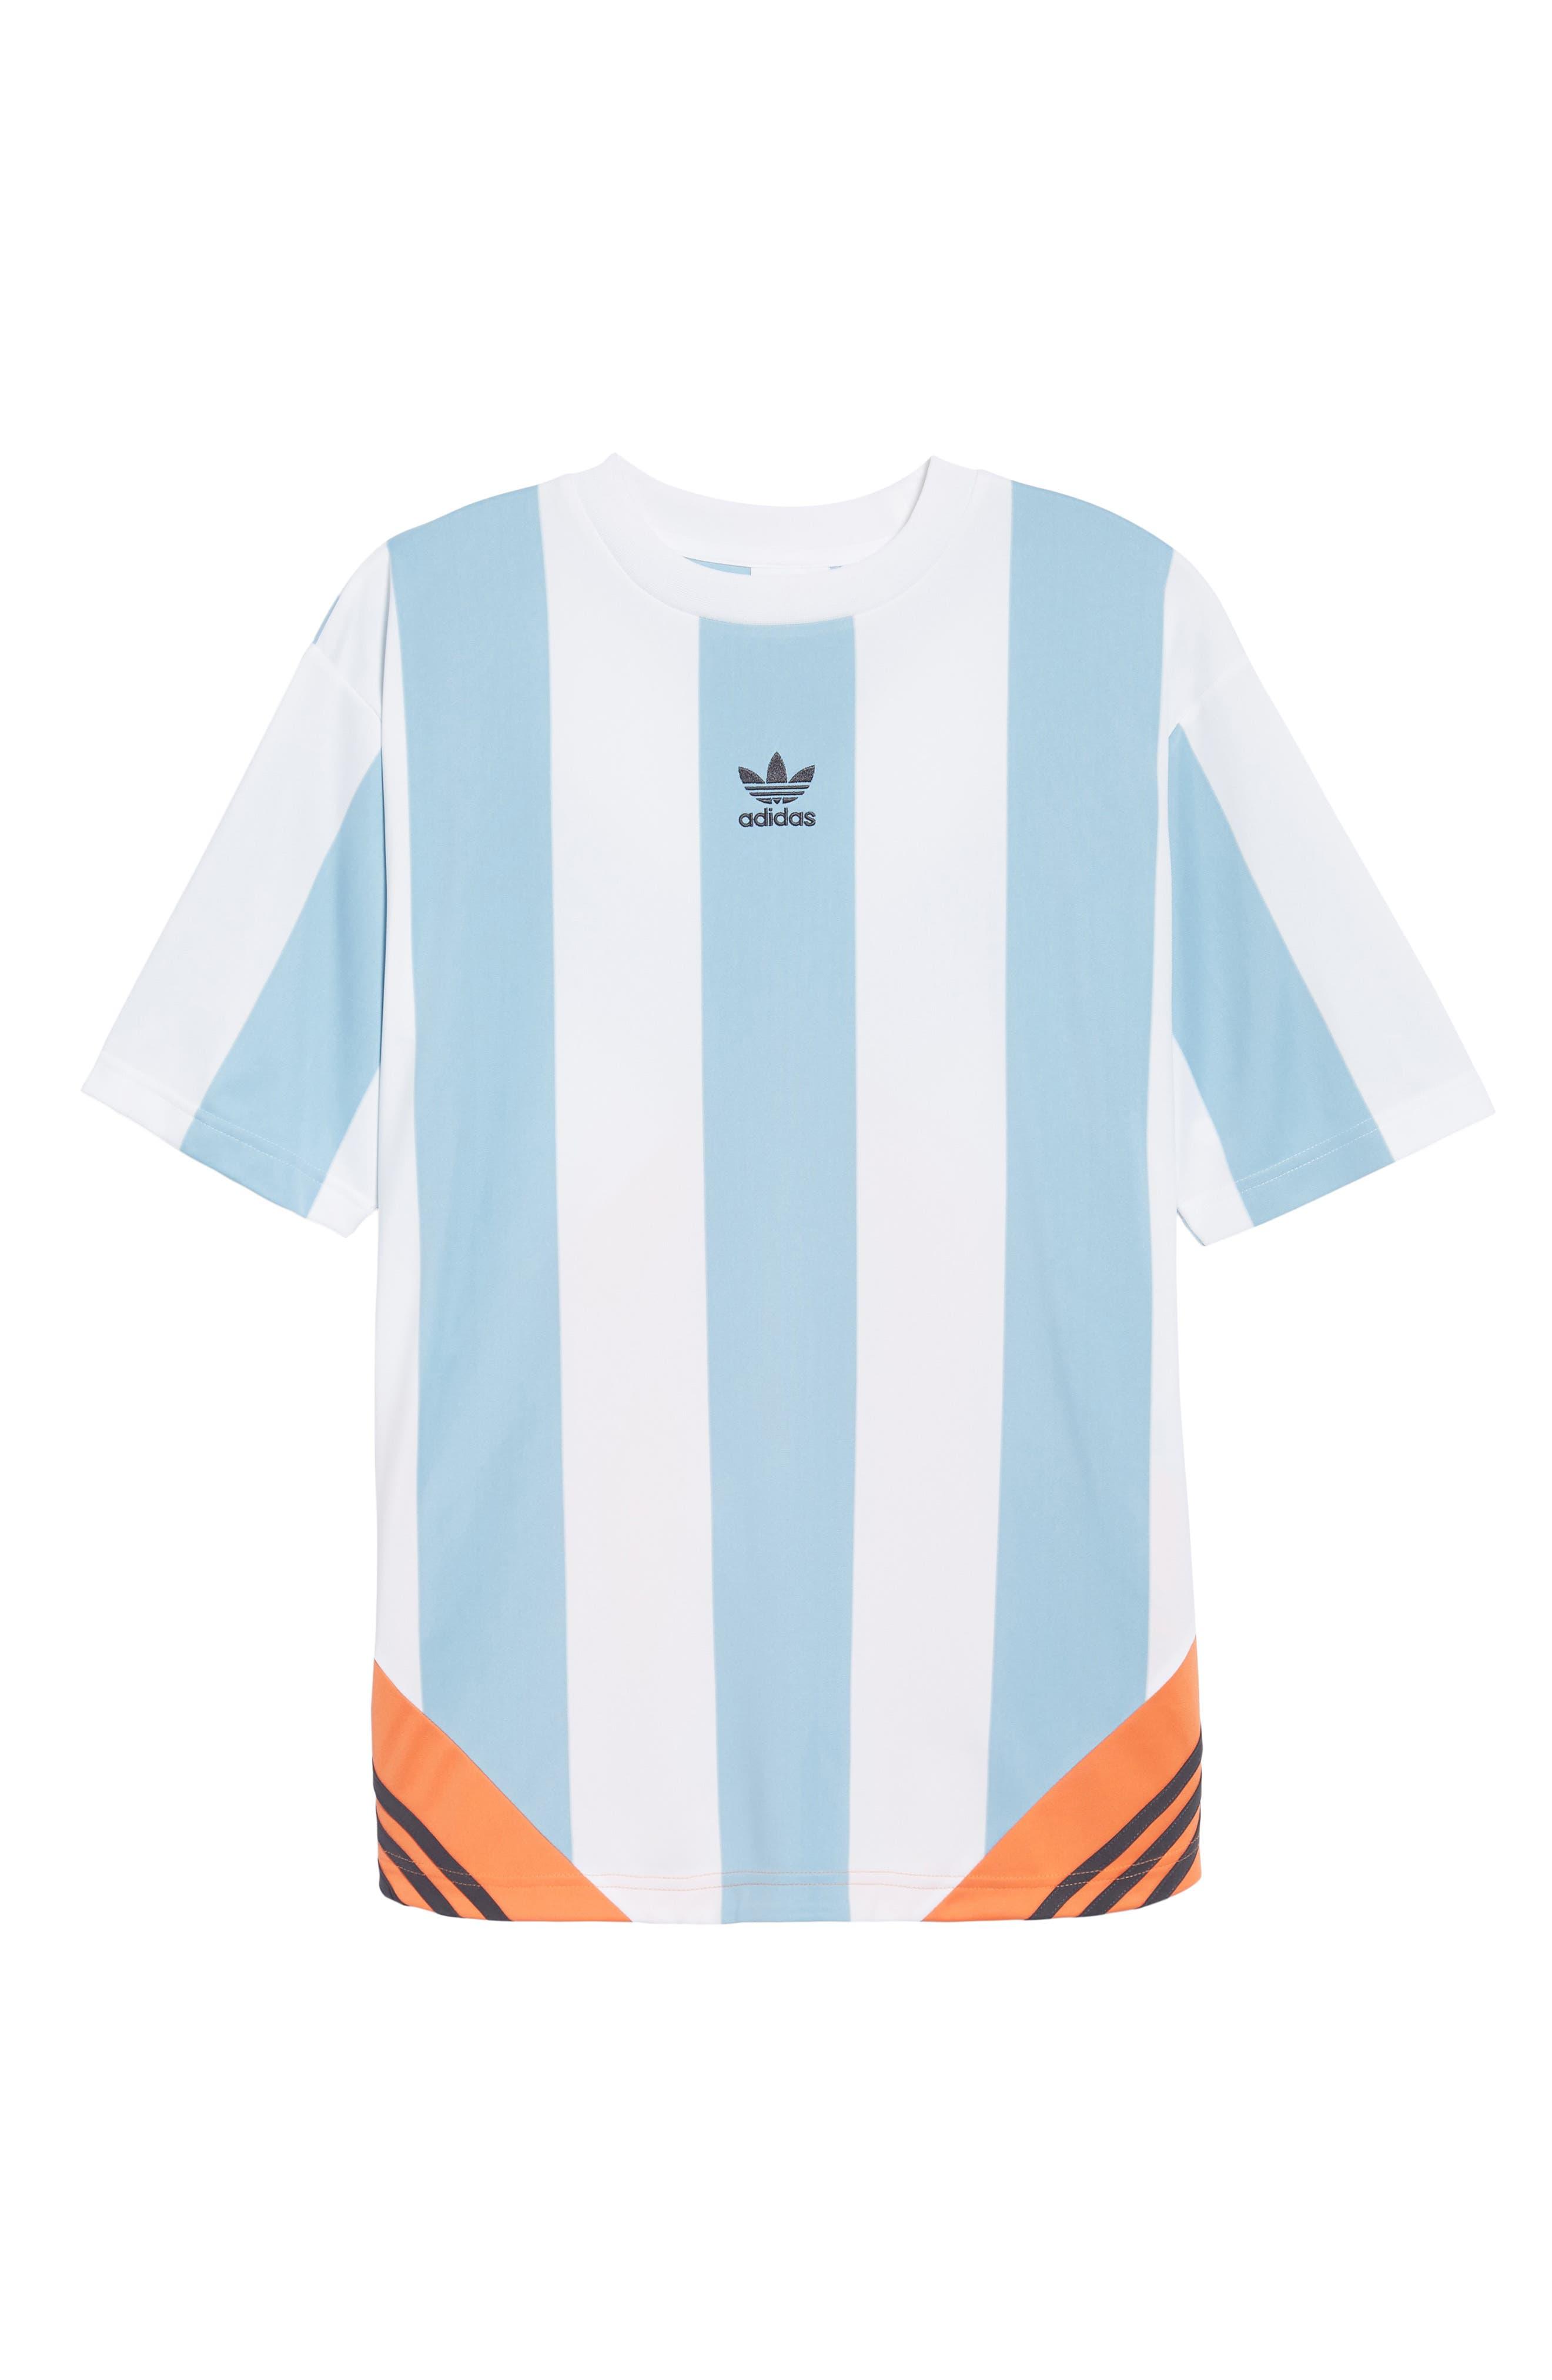 Originals Rival Goalie T-Shirt,                             Alternate thumbnail 6, color,                             Ash Grey/ White